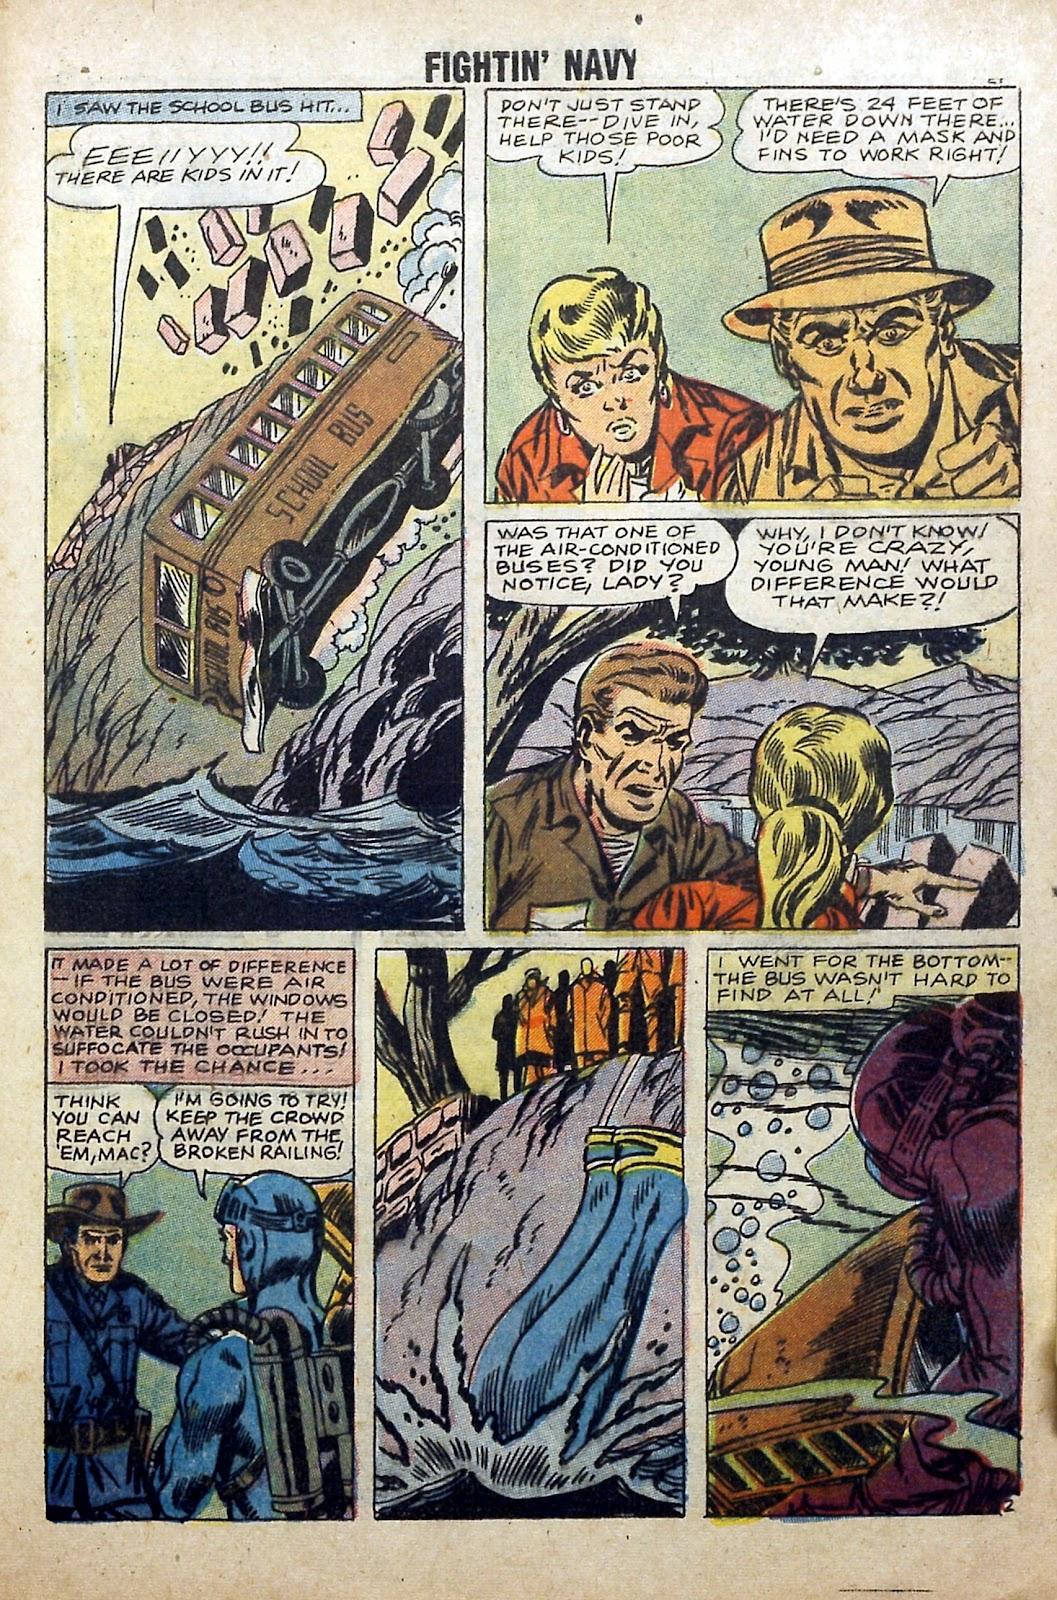 Read online Fightin' Navy comic -  Issue #84 - 29